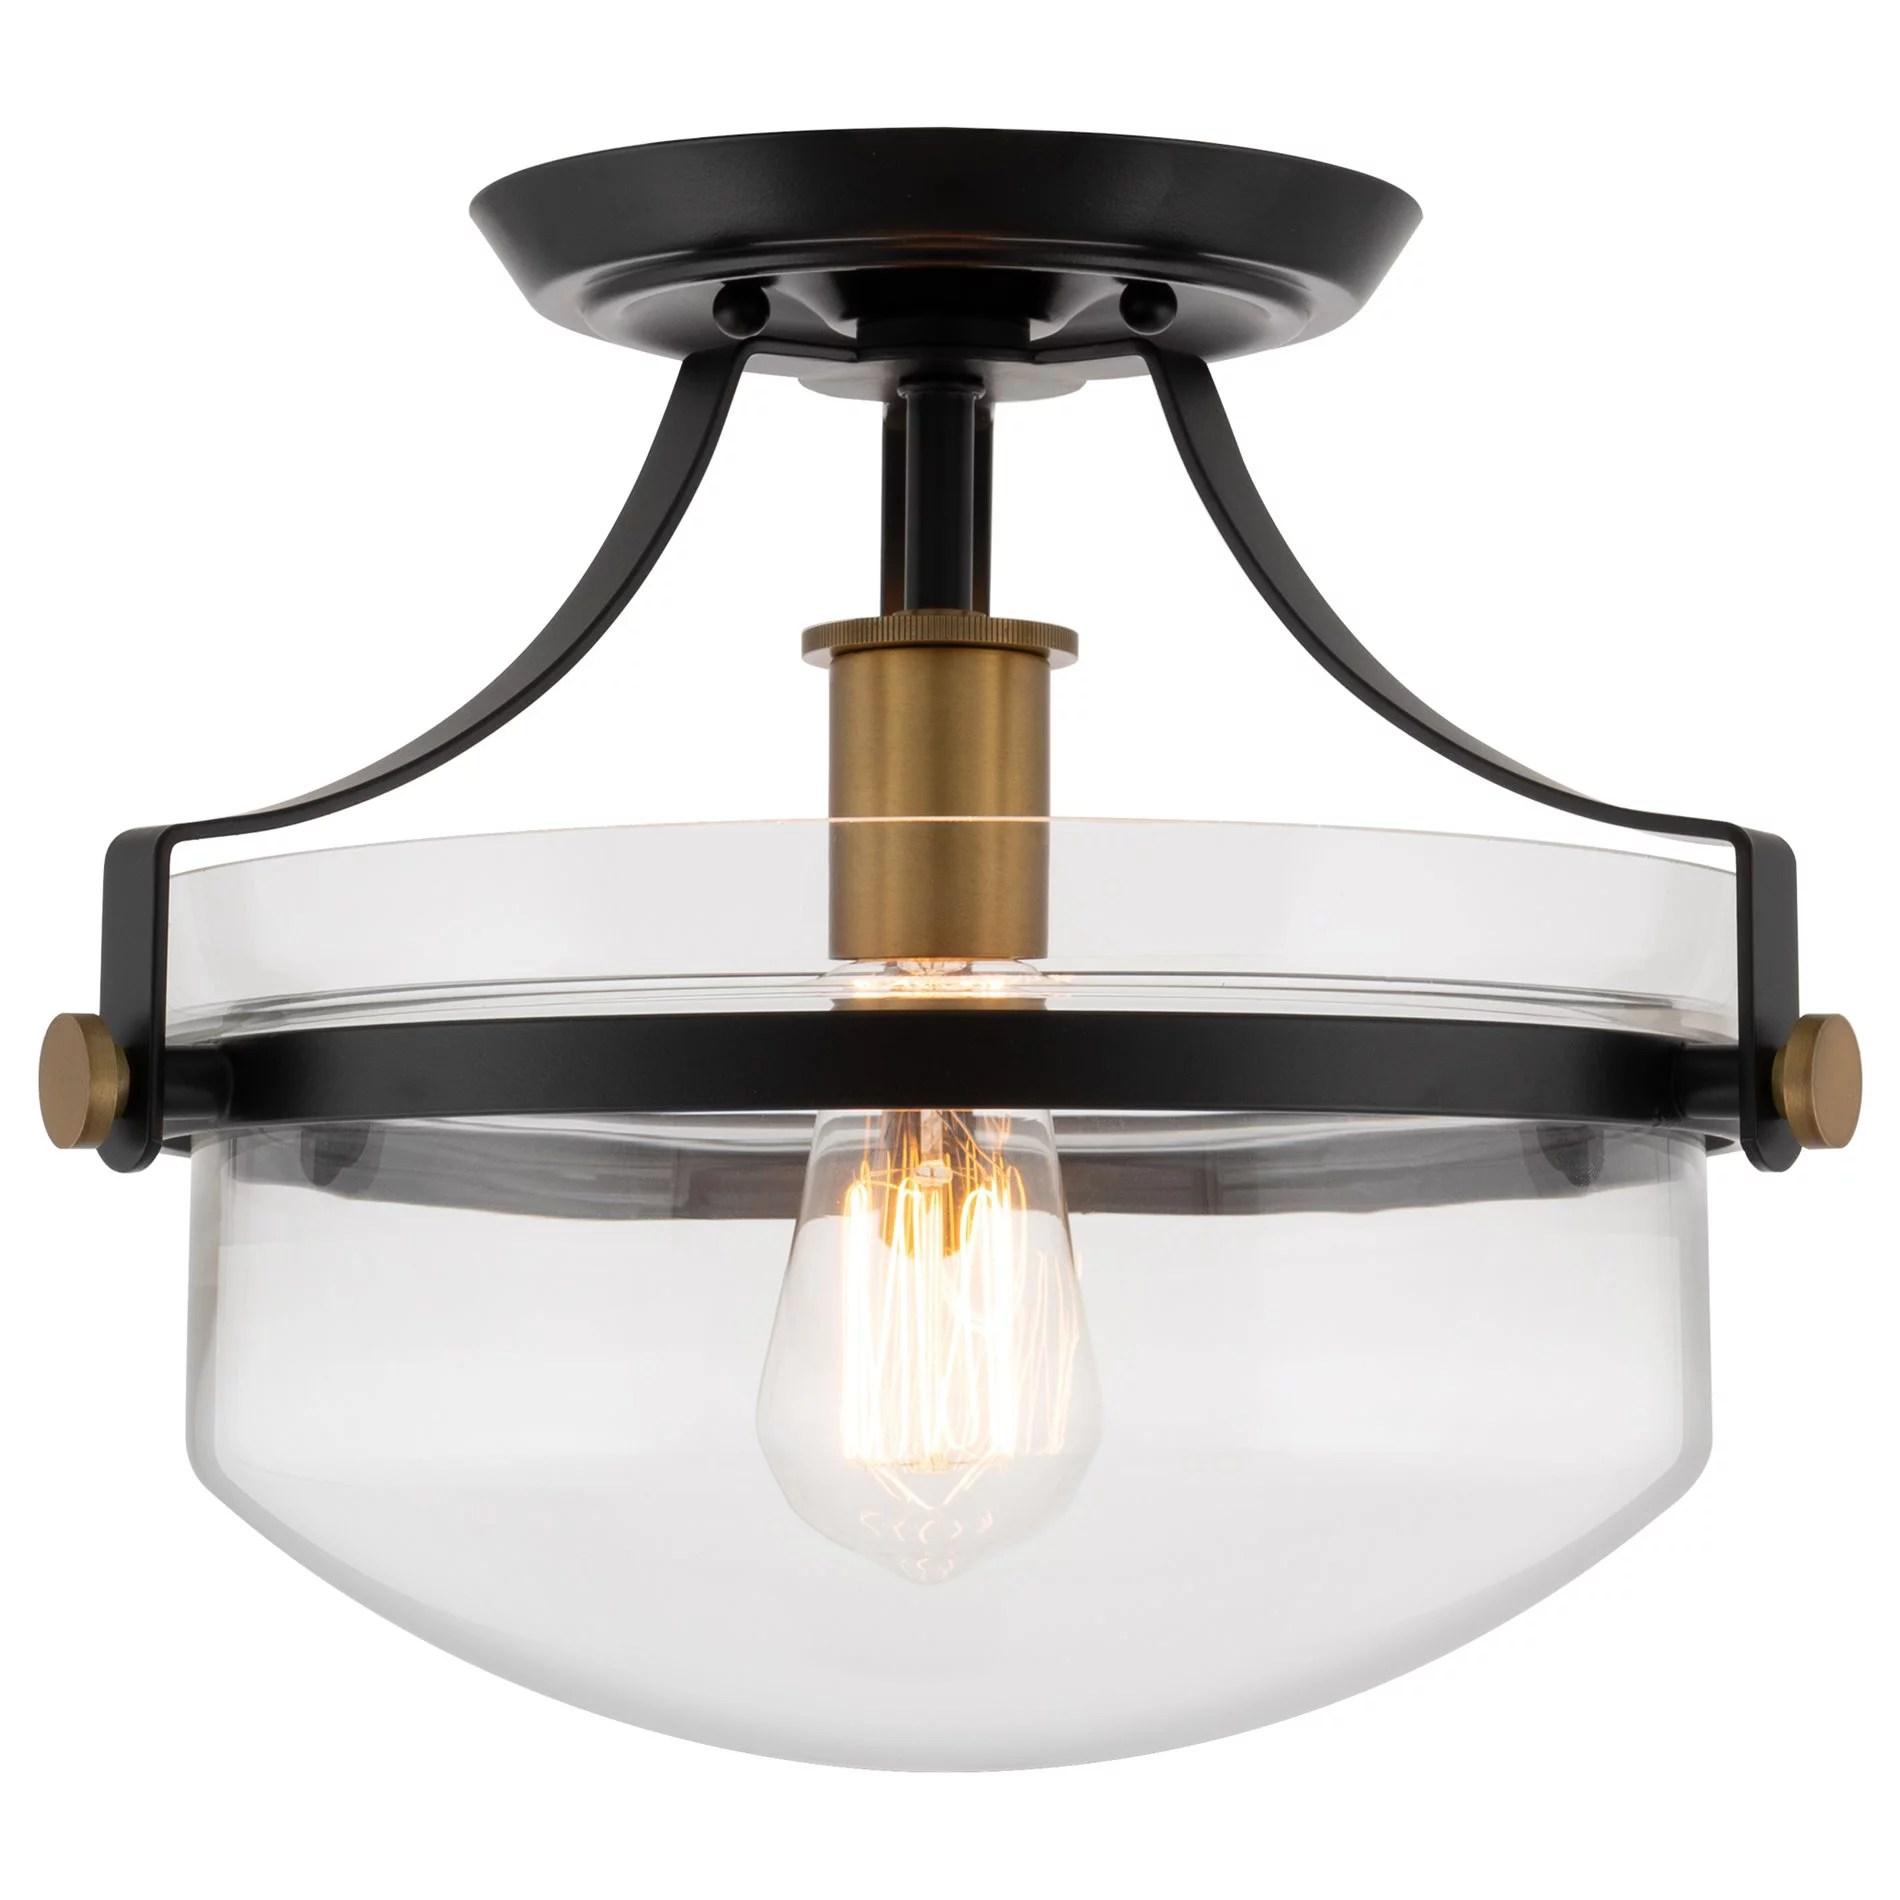 kira home zurich 12 rustic farmhouse semi flush mount ceiling light glass shade warm brass accents black finish walmart com